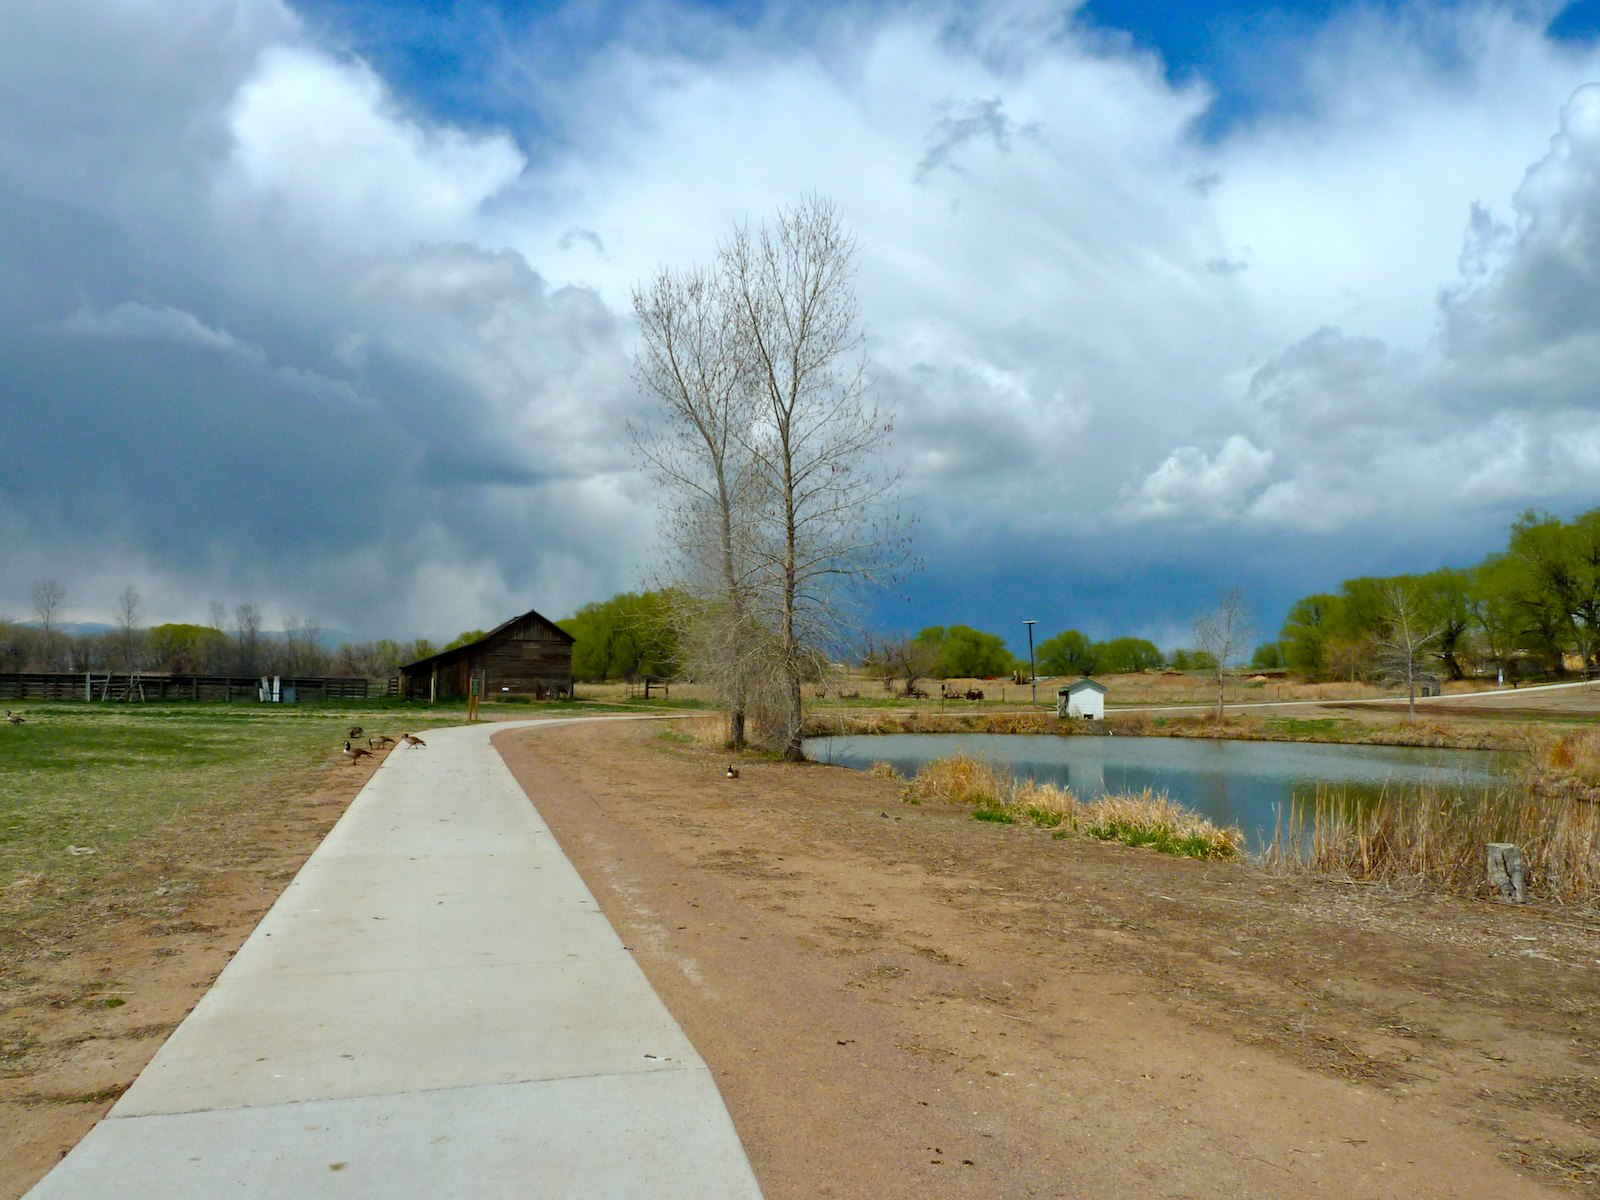 St. Vrain Greenway Trail in Longmont, Colorado